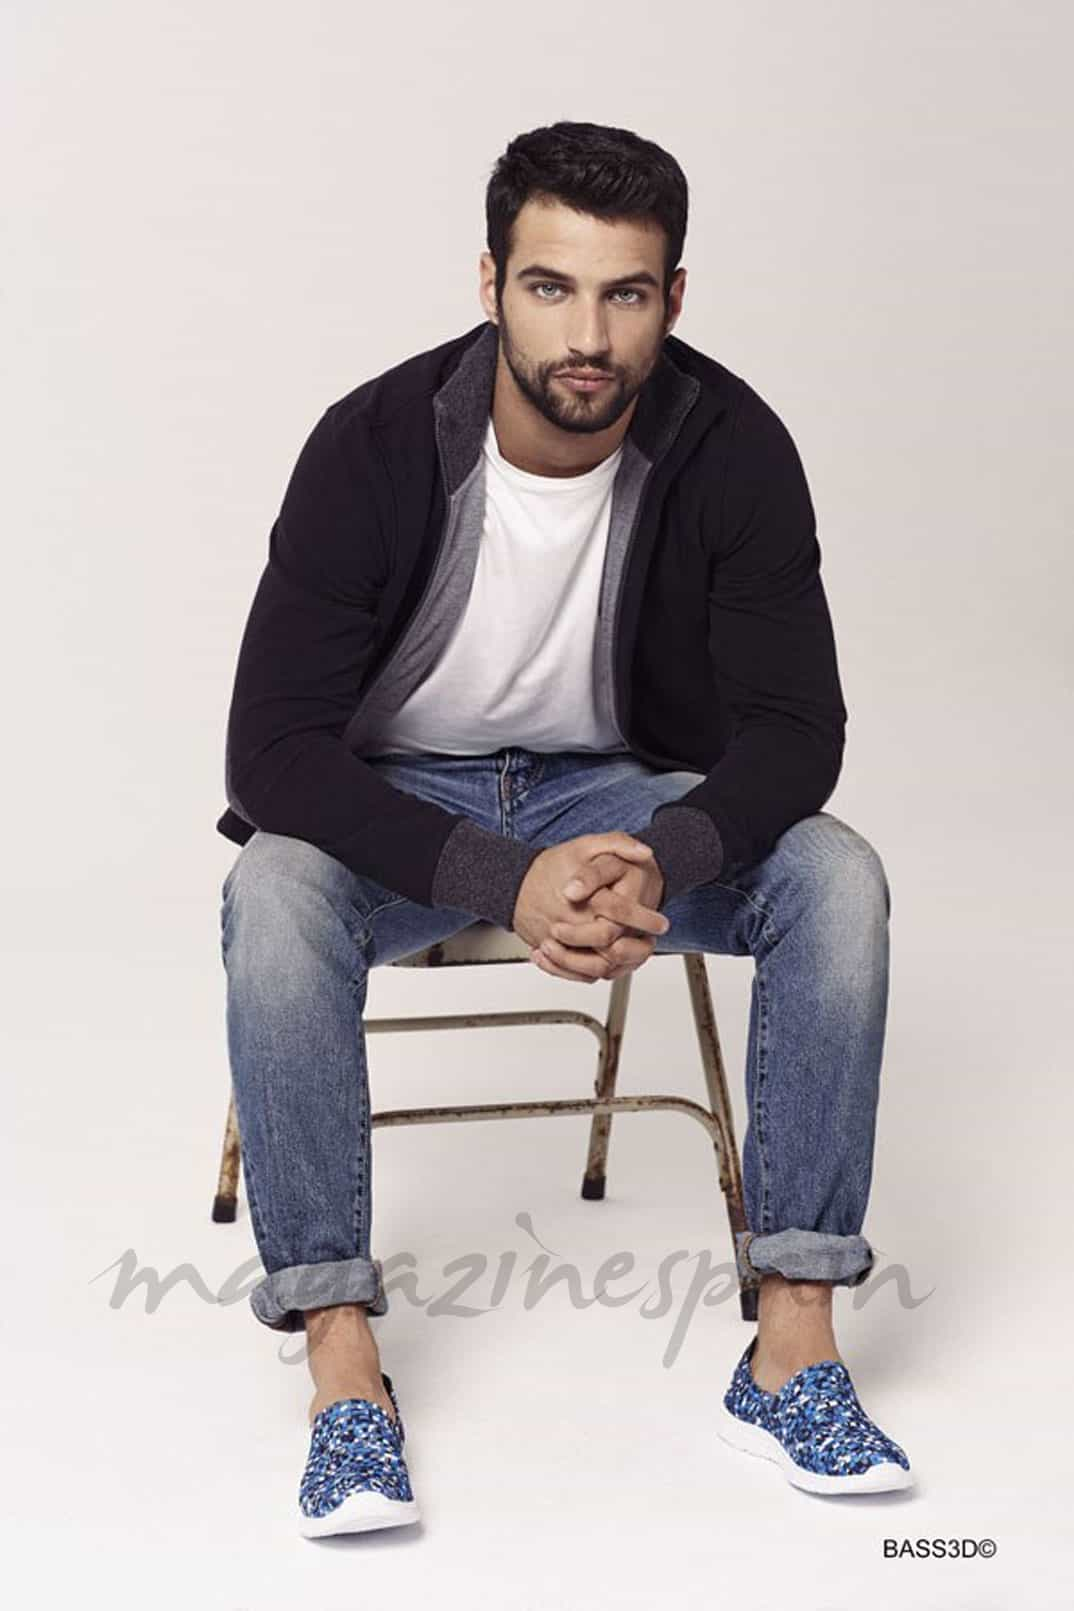 Jesus-Castro-actor